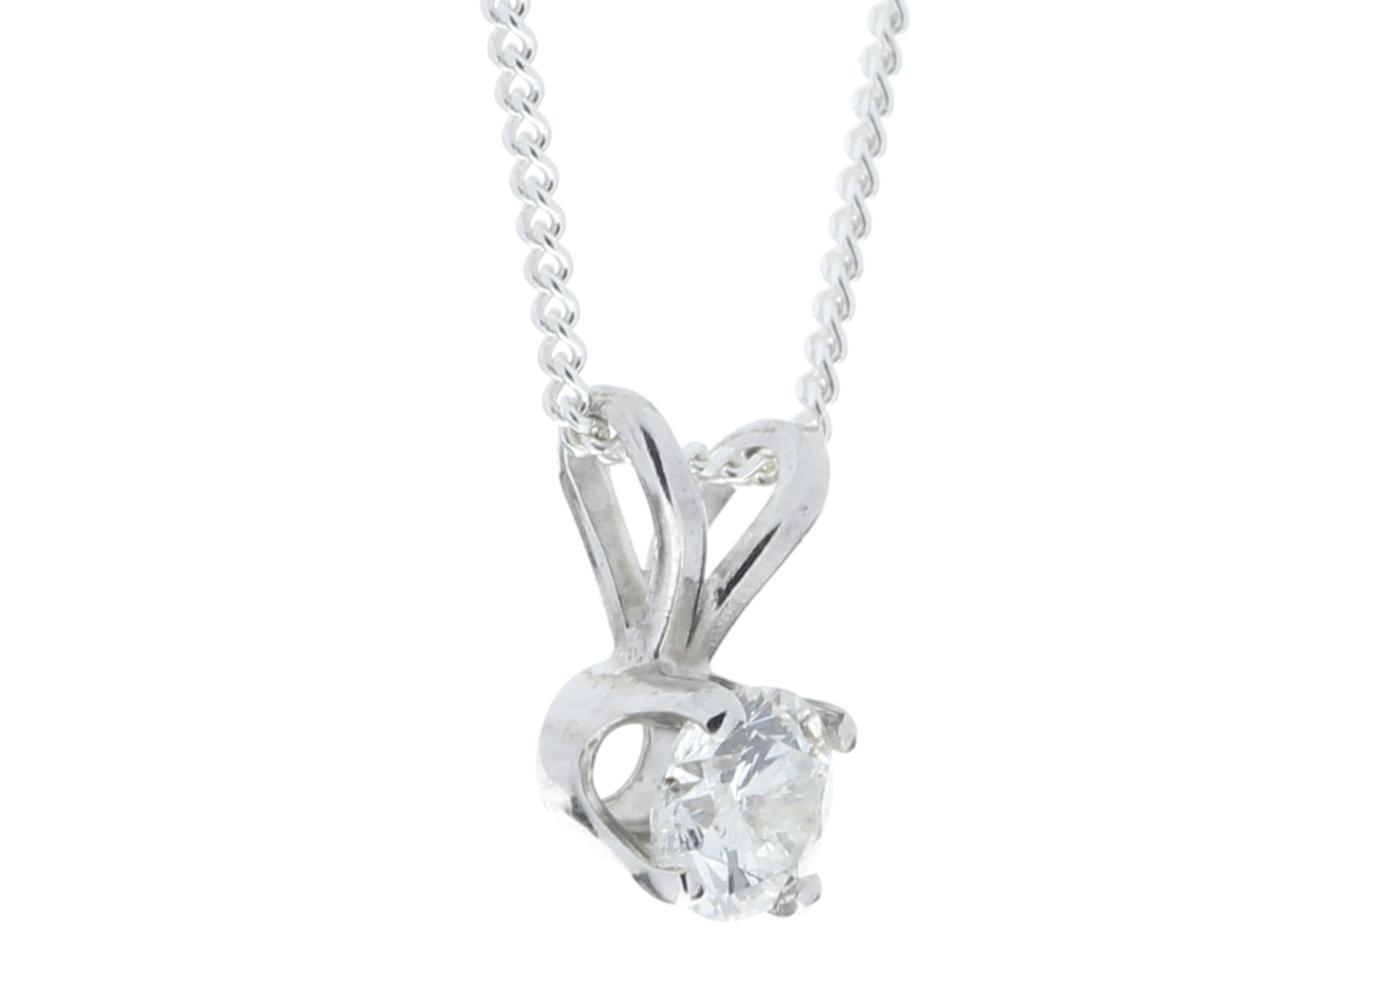 9ct White Gold Single Stone Claw Set Diamond Pendant 0.20 Carats - Image 2 of 5